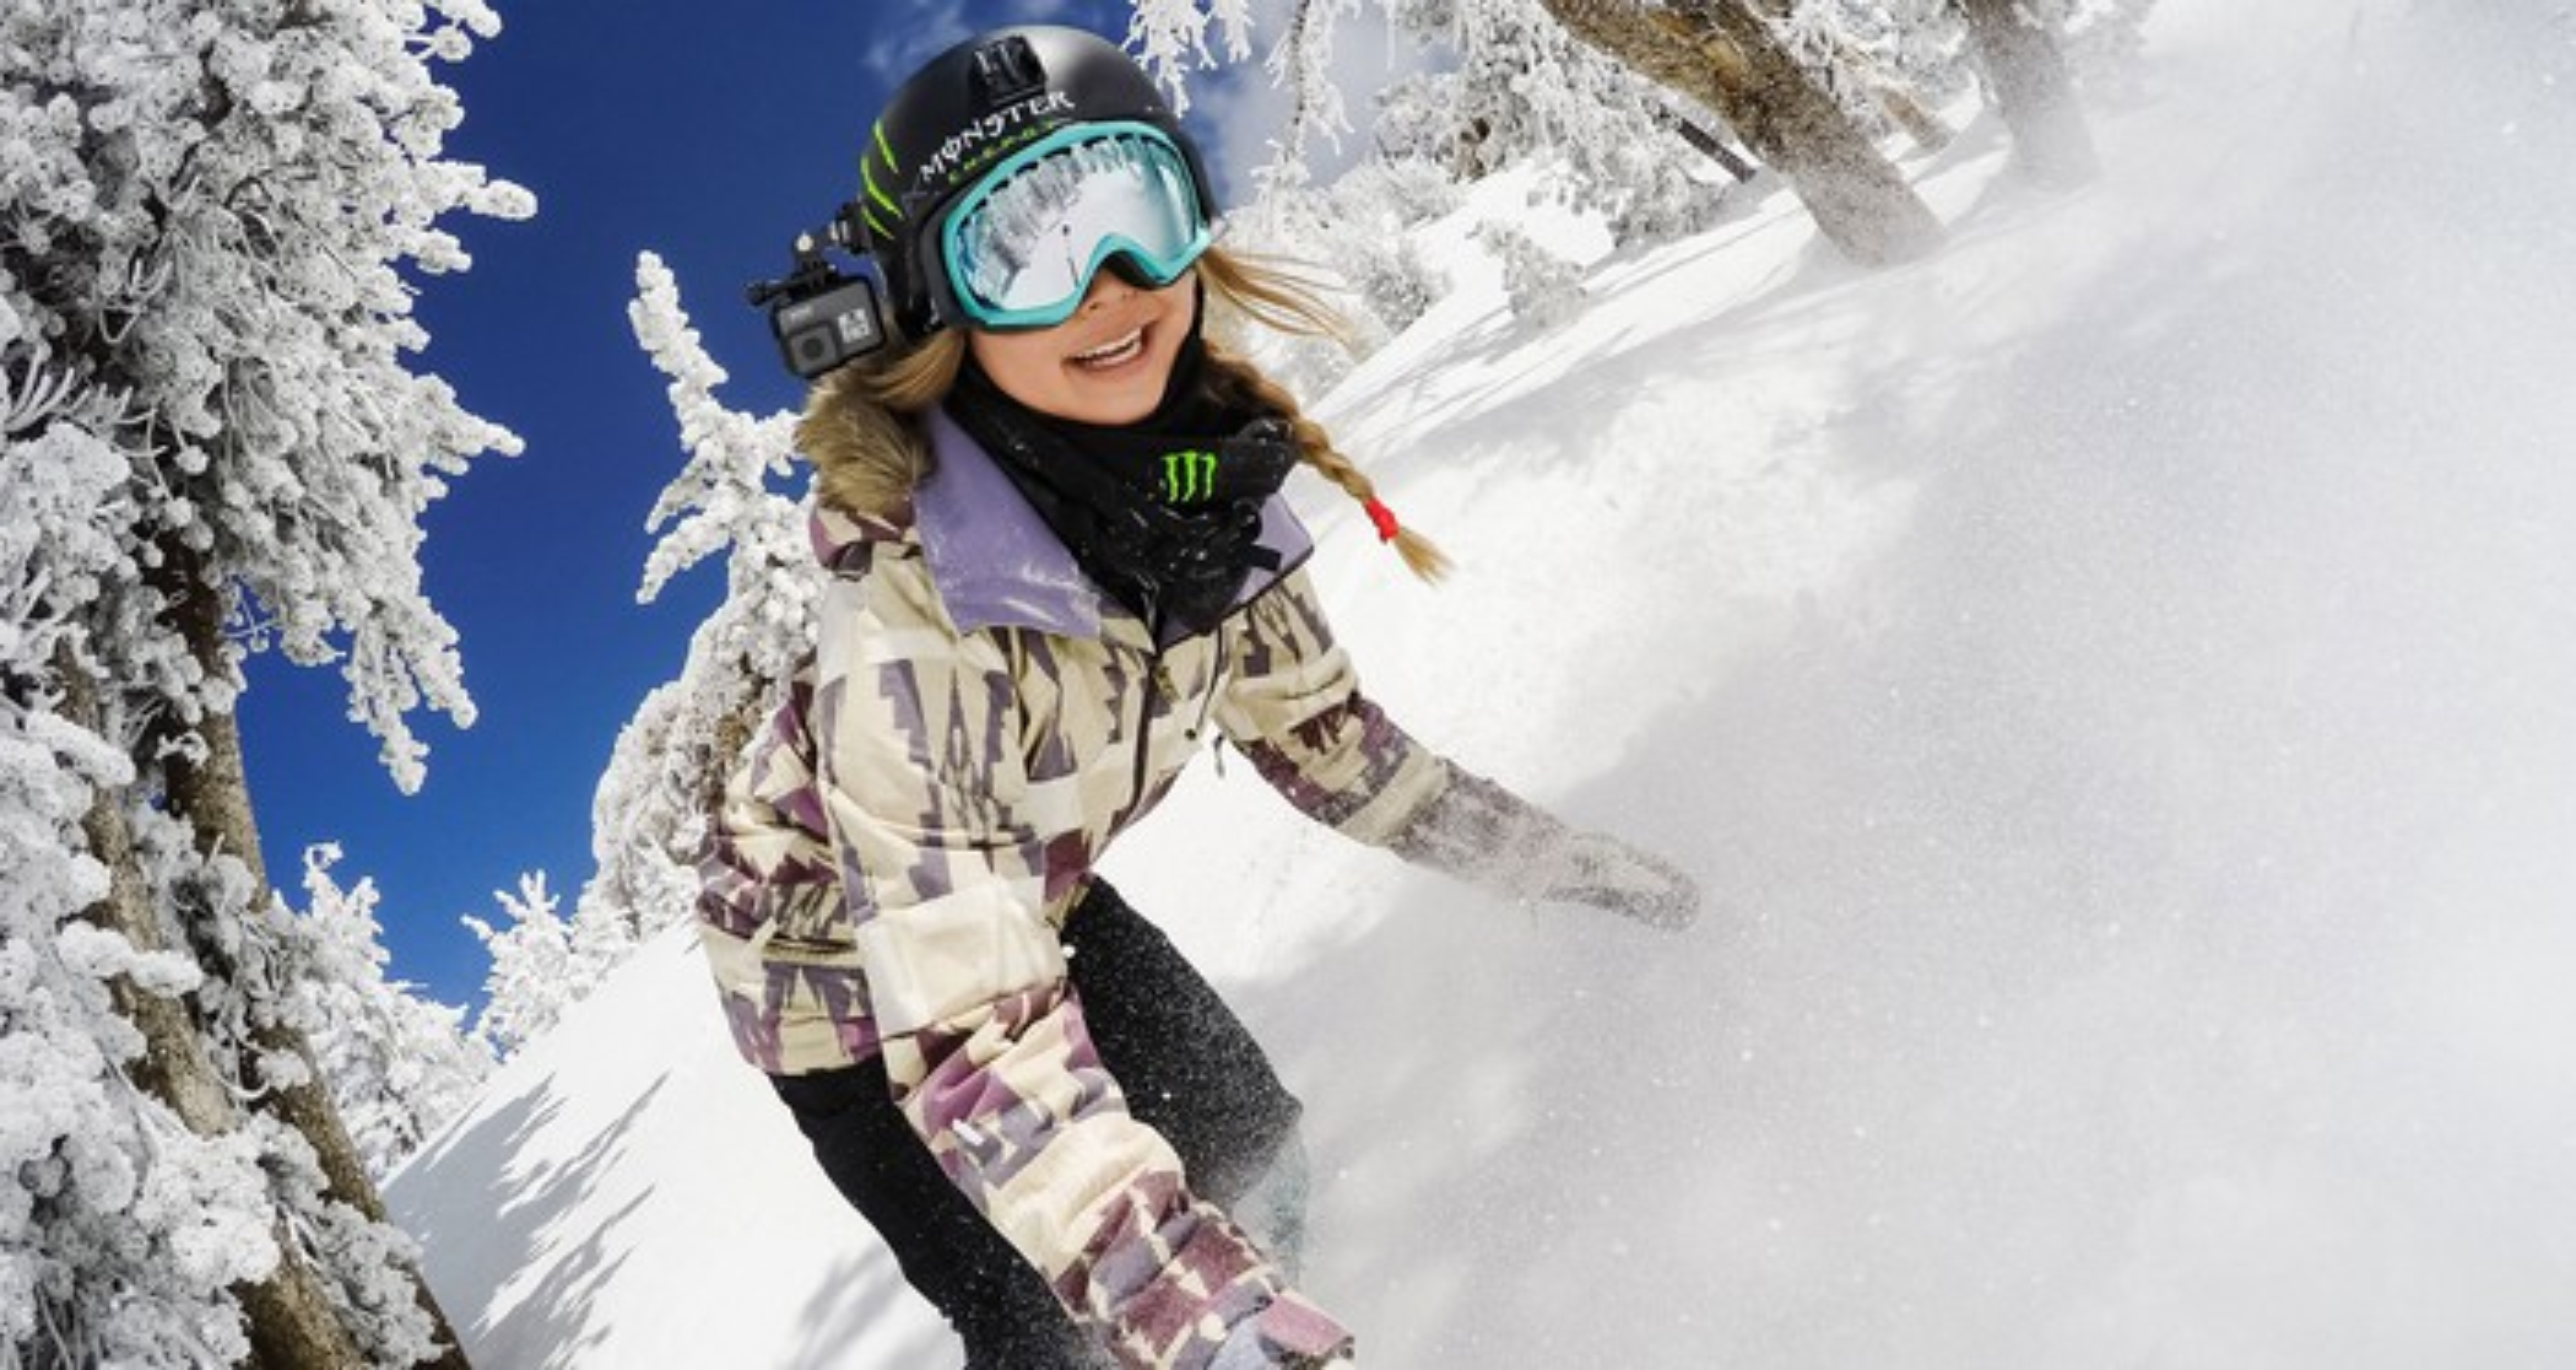 Snowboarder wearing a GoPro camera